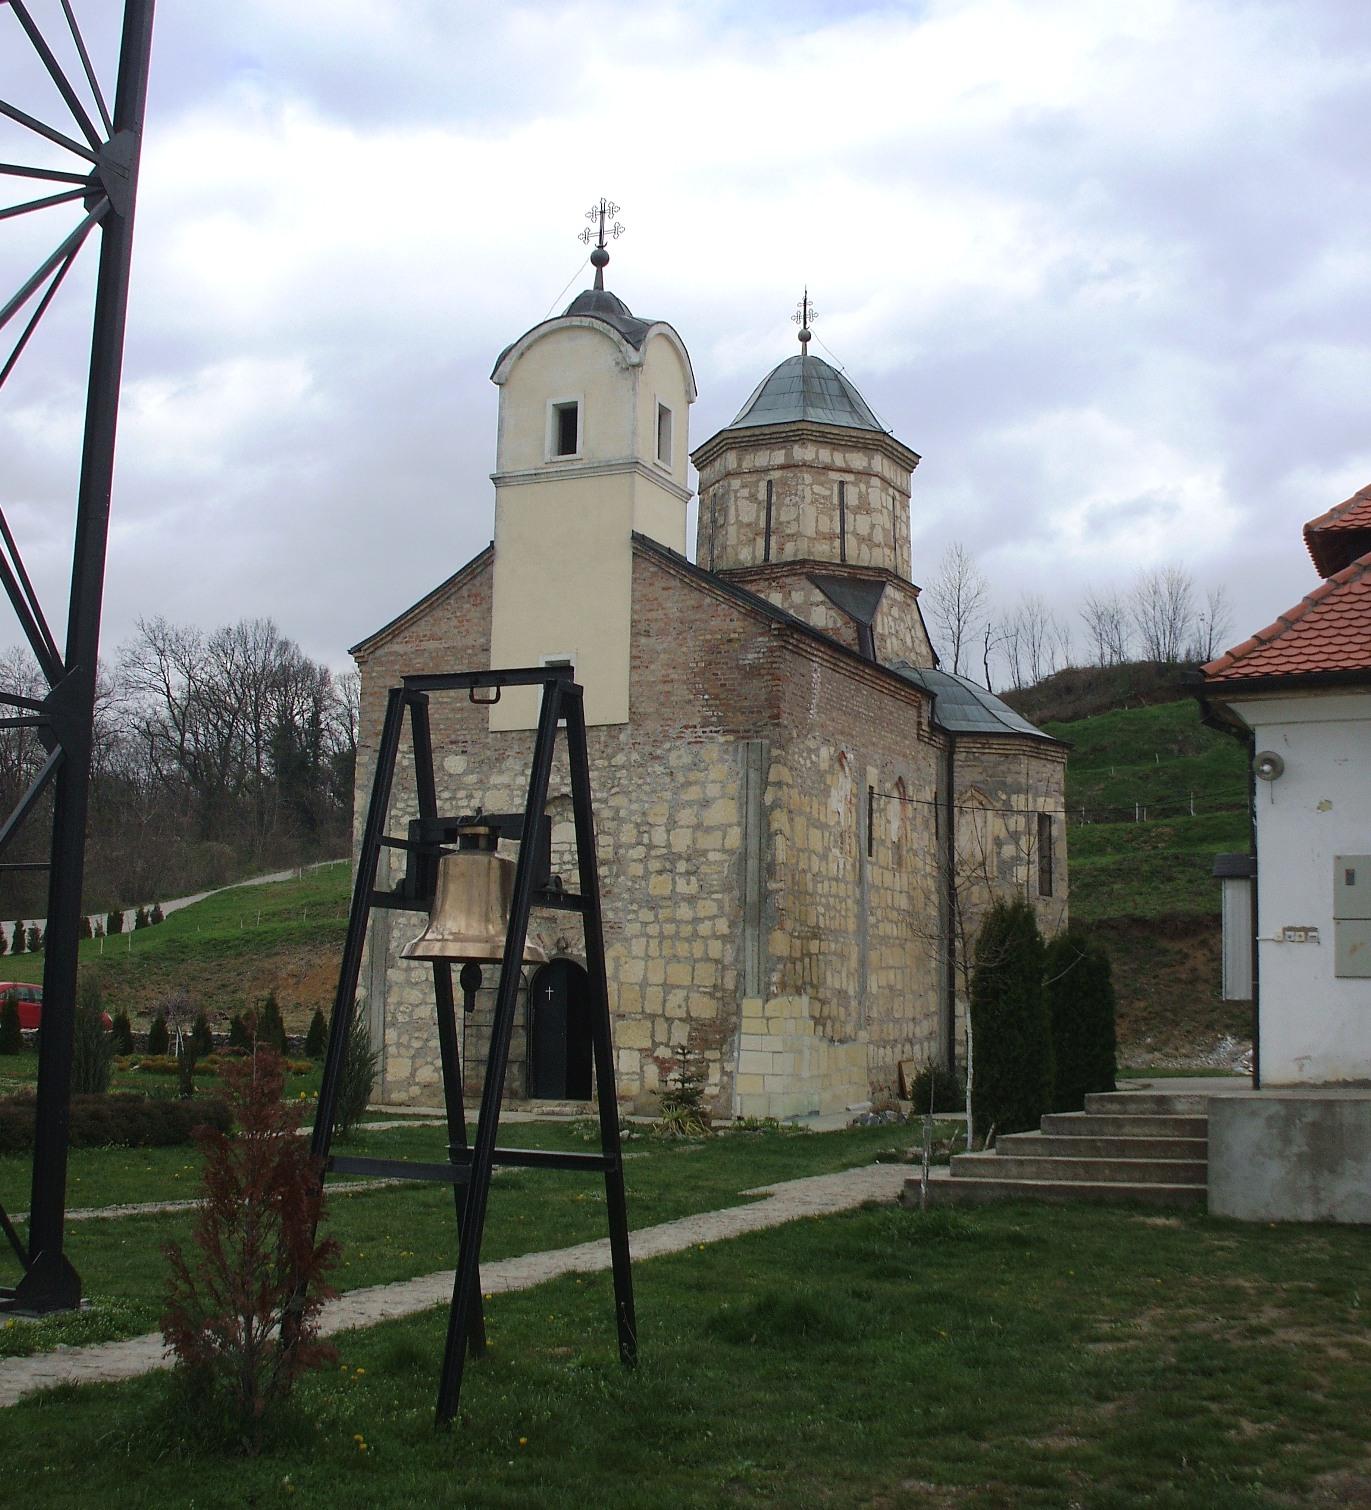 Petkovica_Monastery_Fruška_gora.jpg - 534,05 kB